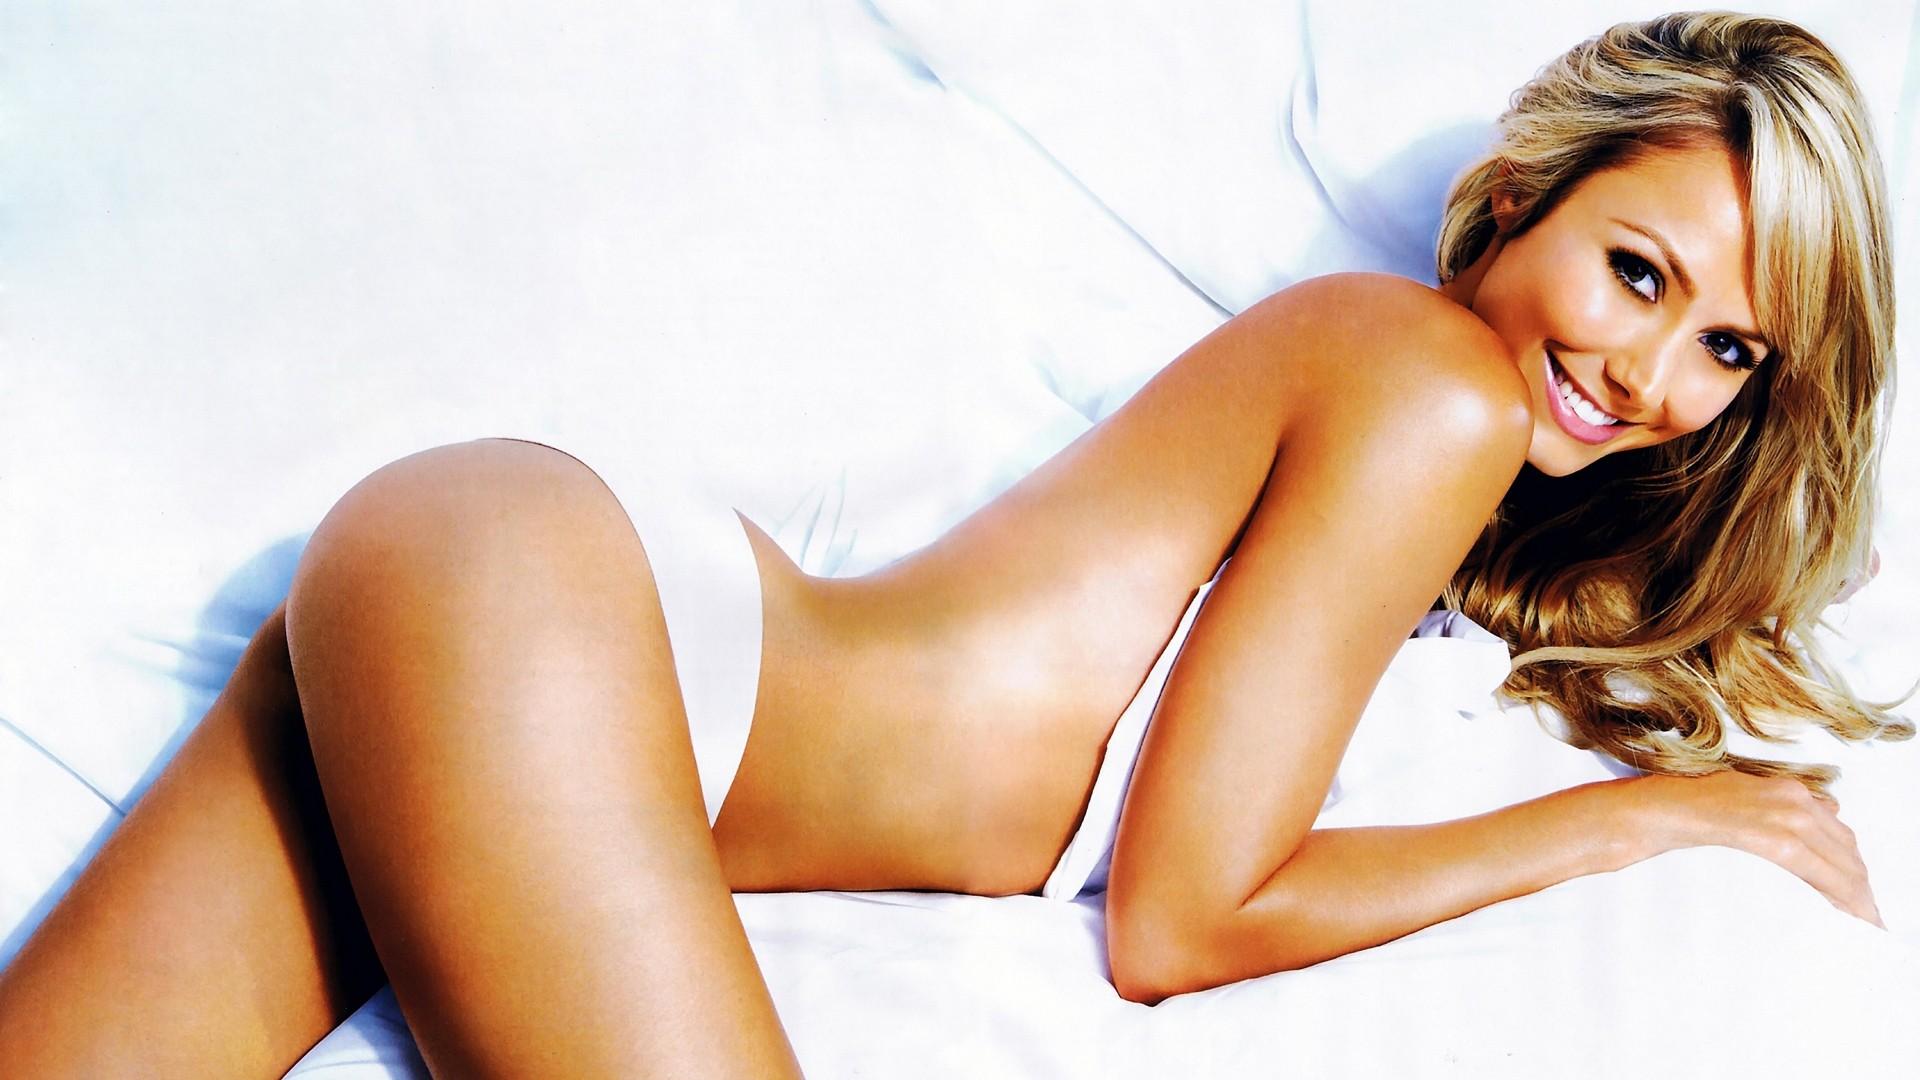 Stacy keibler celebrity naked pics